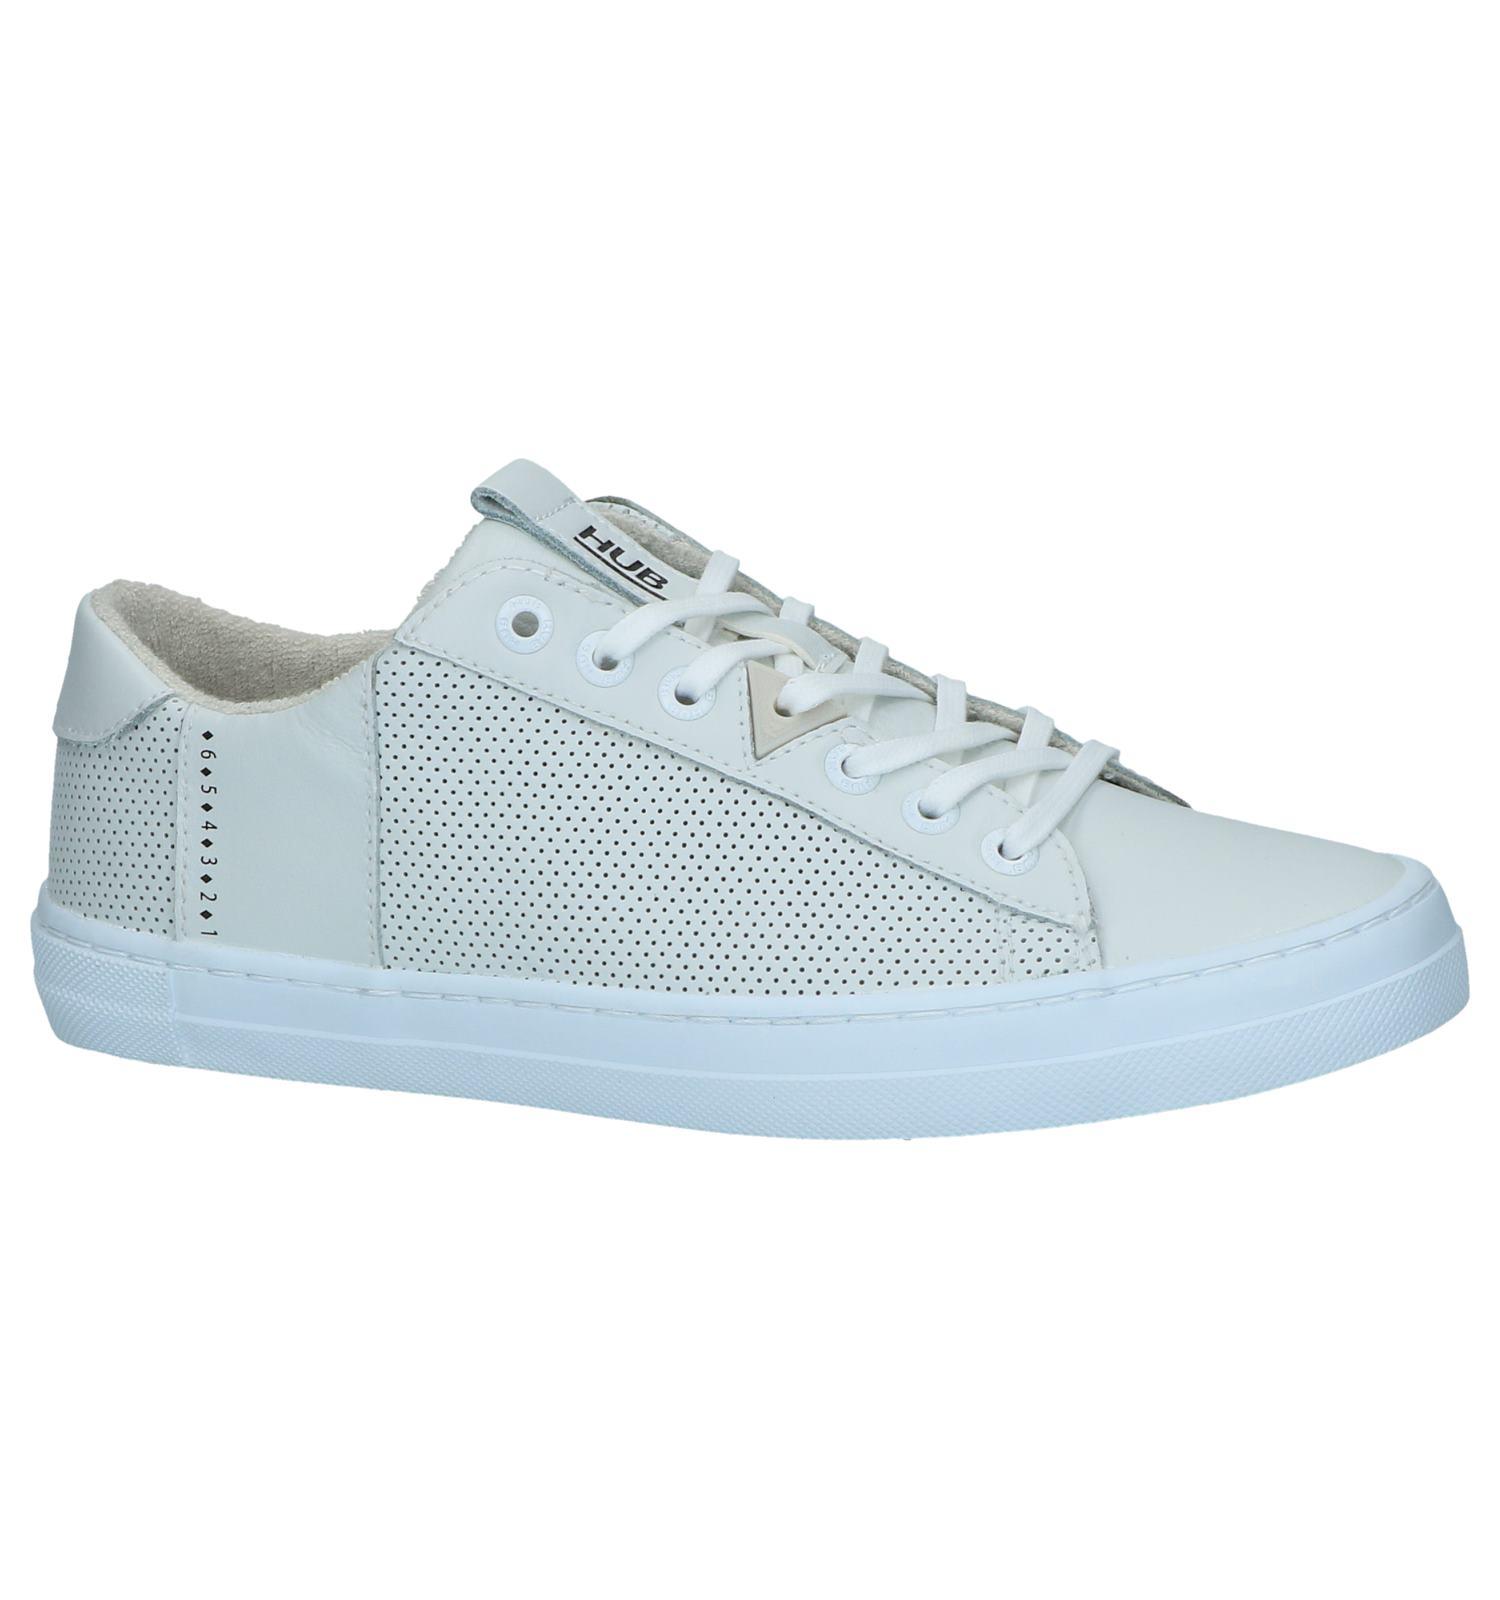 Witte Geklede Sneakers Hub Hook | SCHOENENTORFS.NL | Gratis verzend en retour